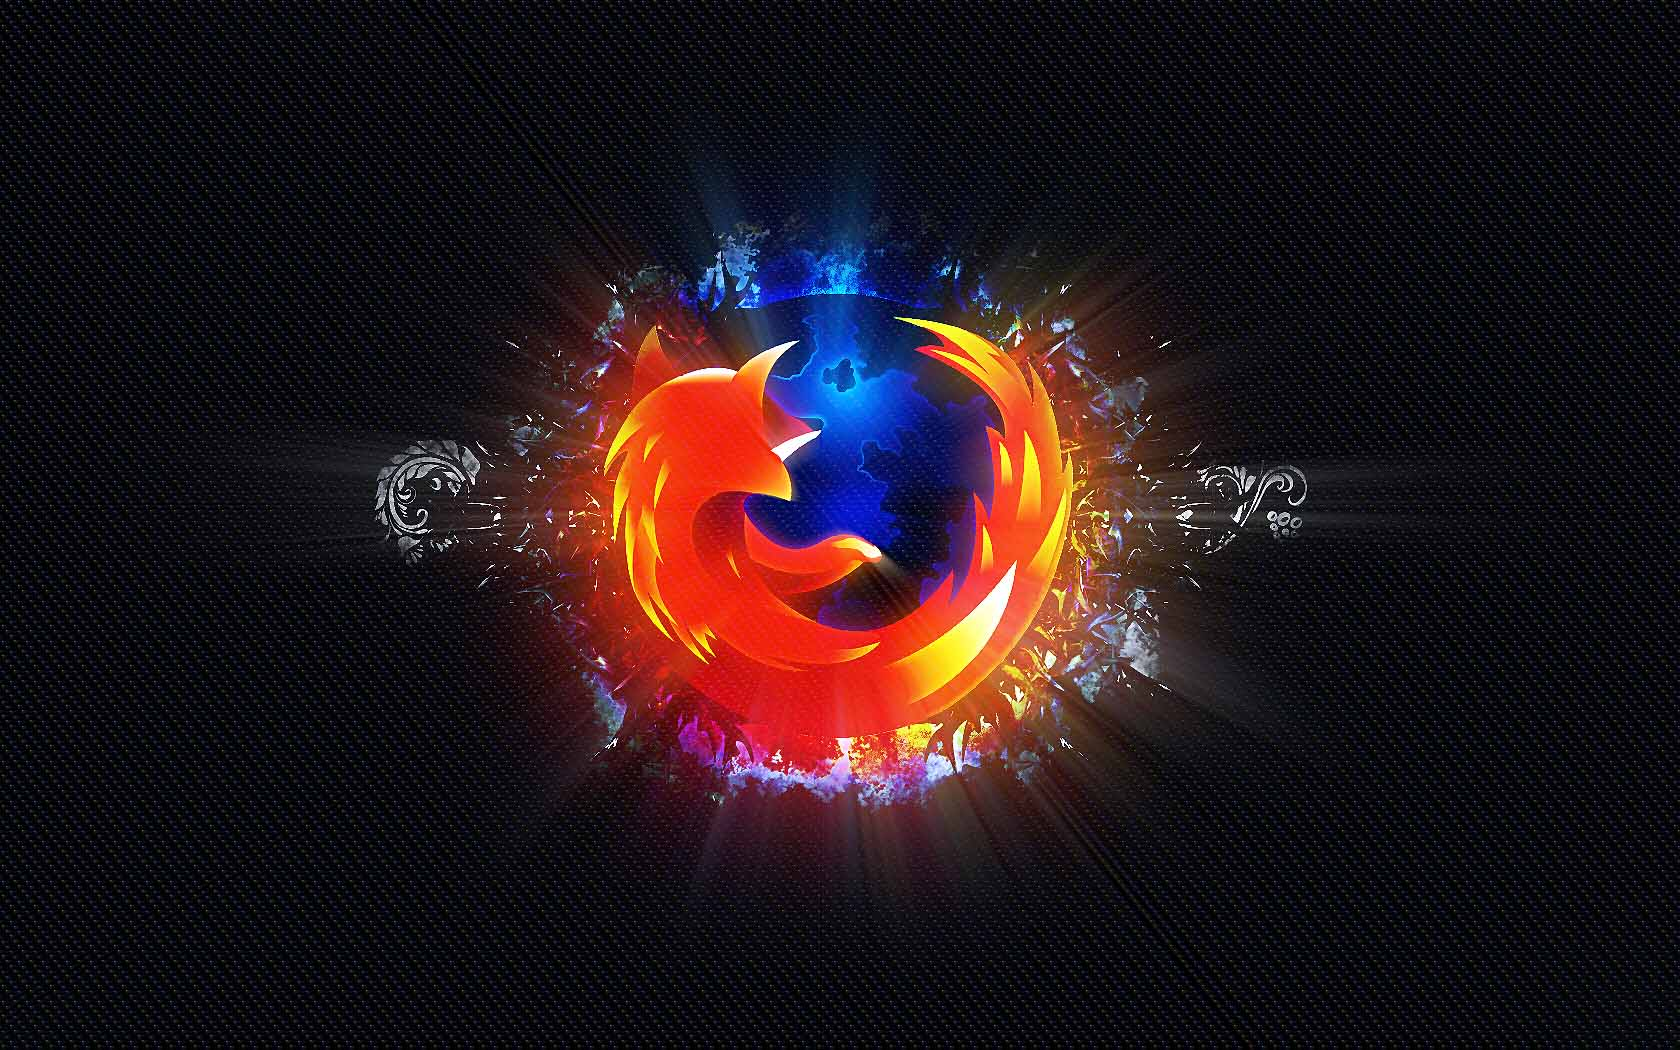 Firefox Image IntelligentHQ